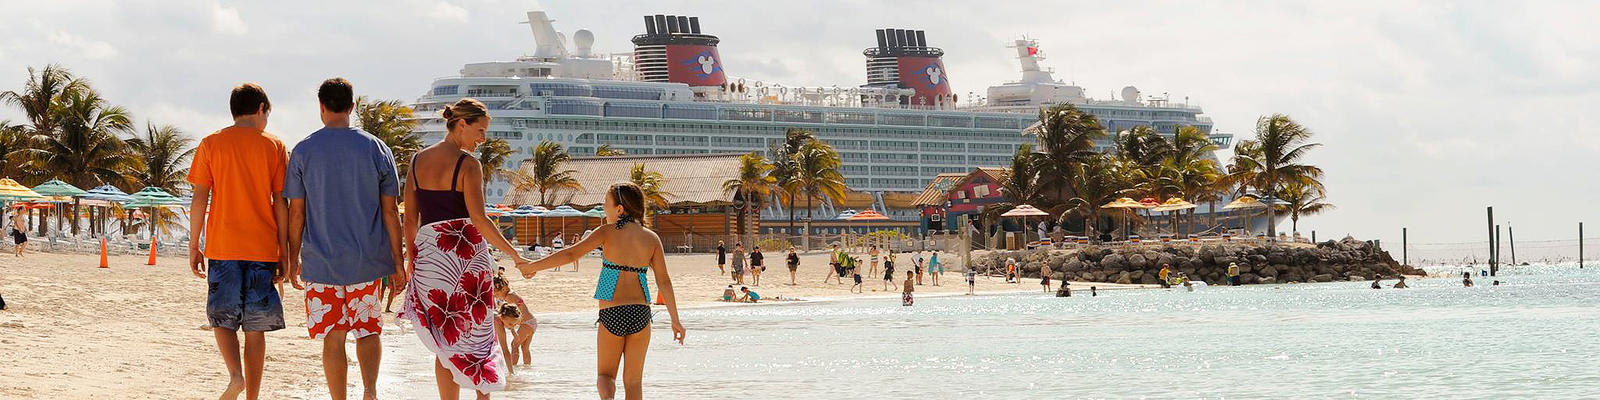 Disney Cruising with Family (Photo: Disney Cruise Line)